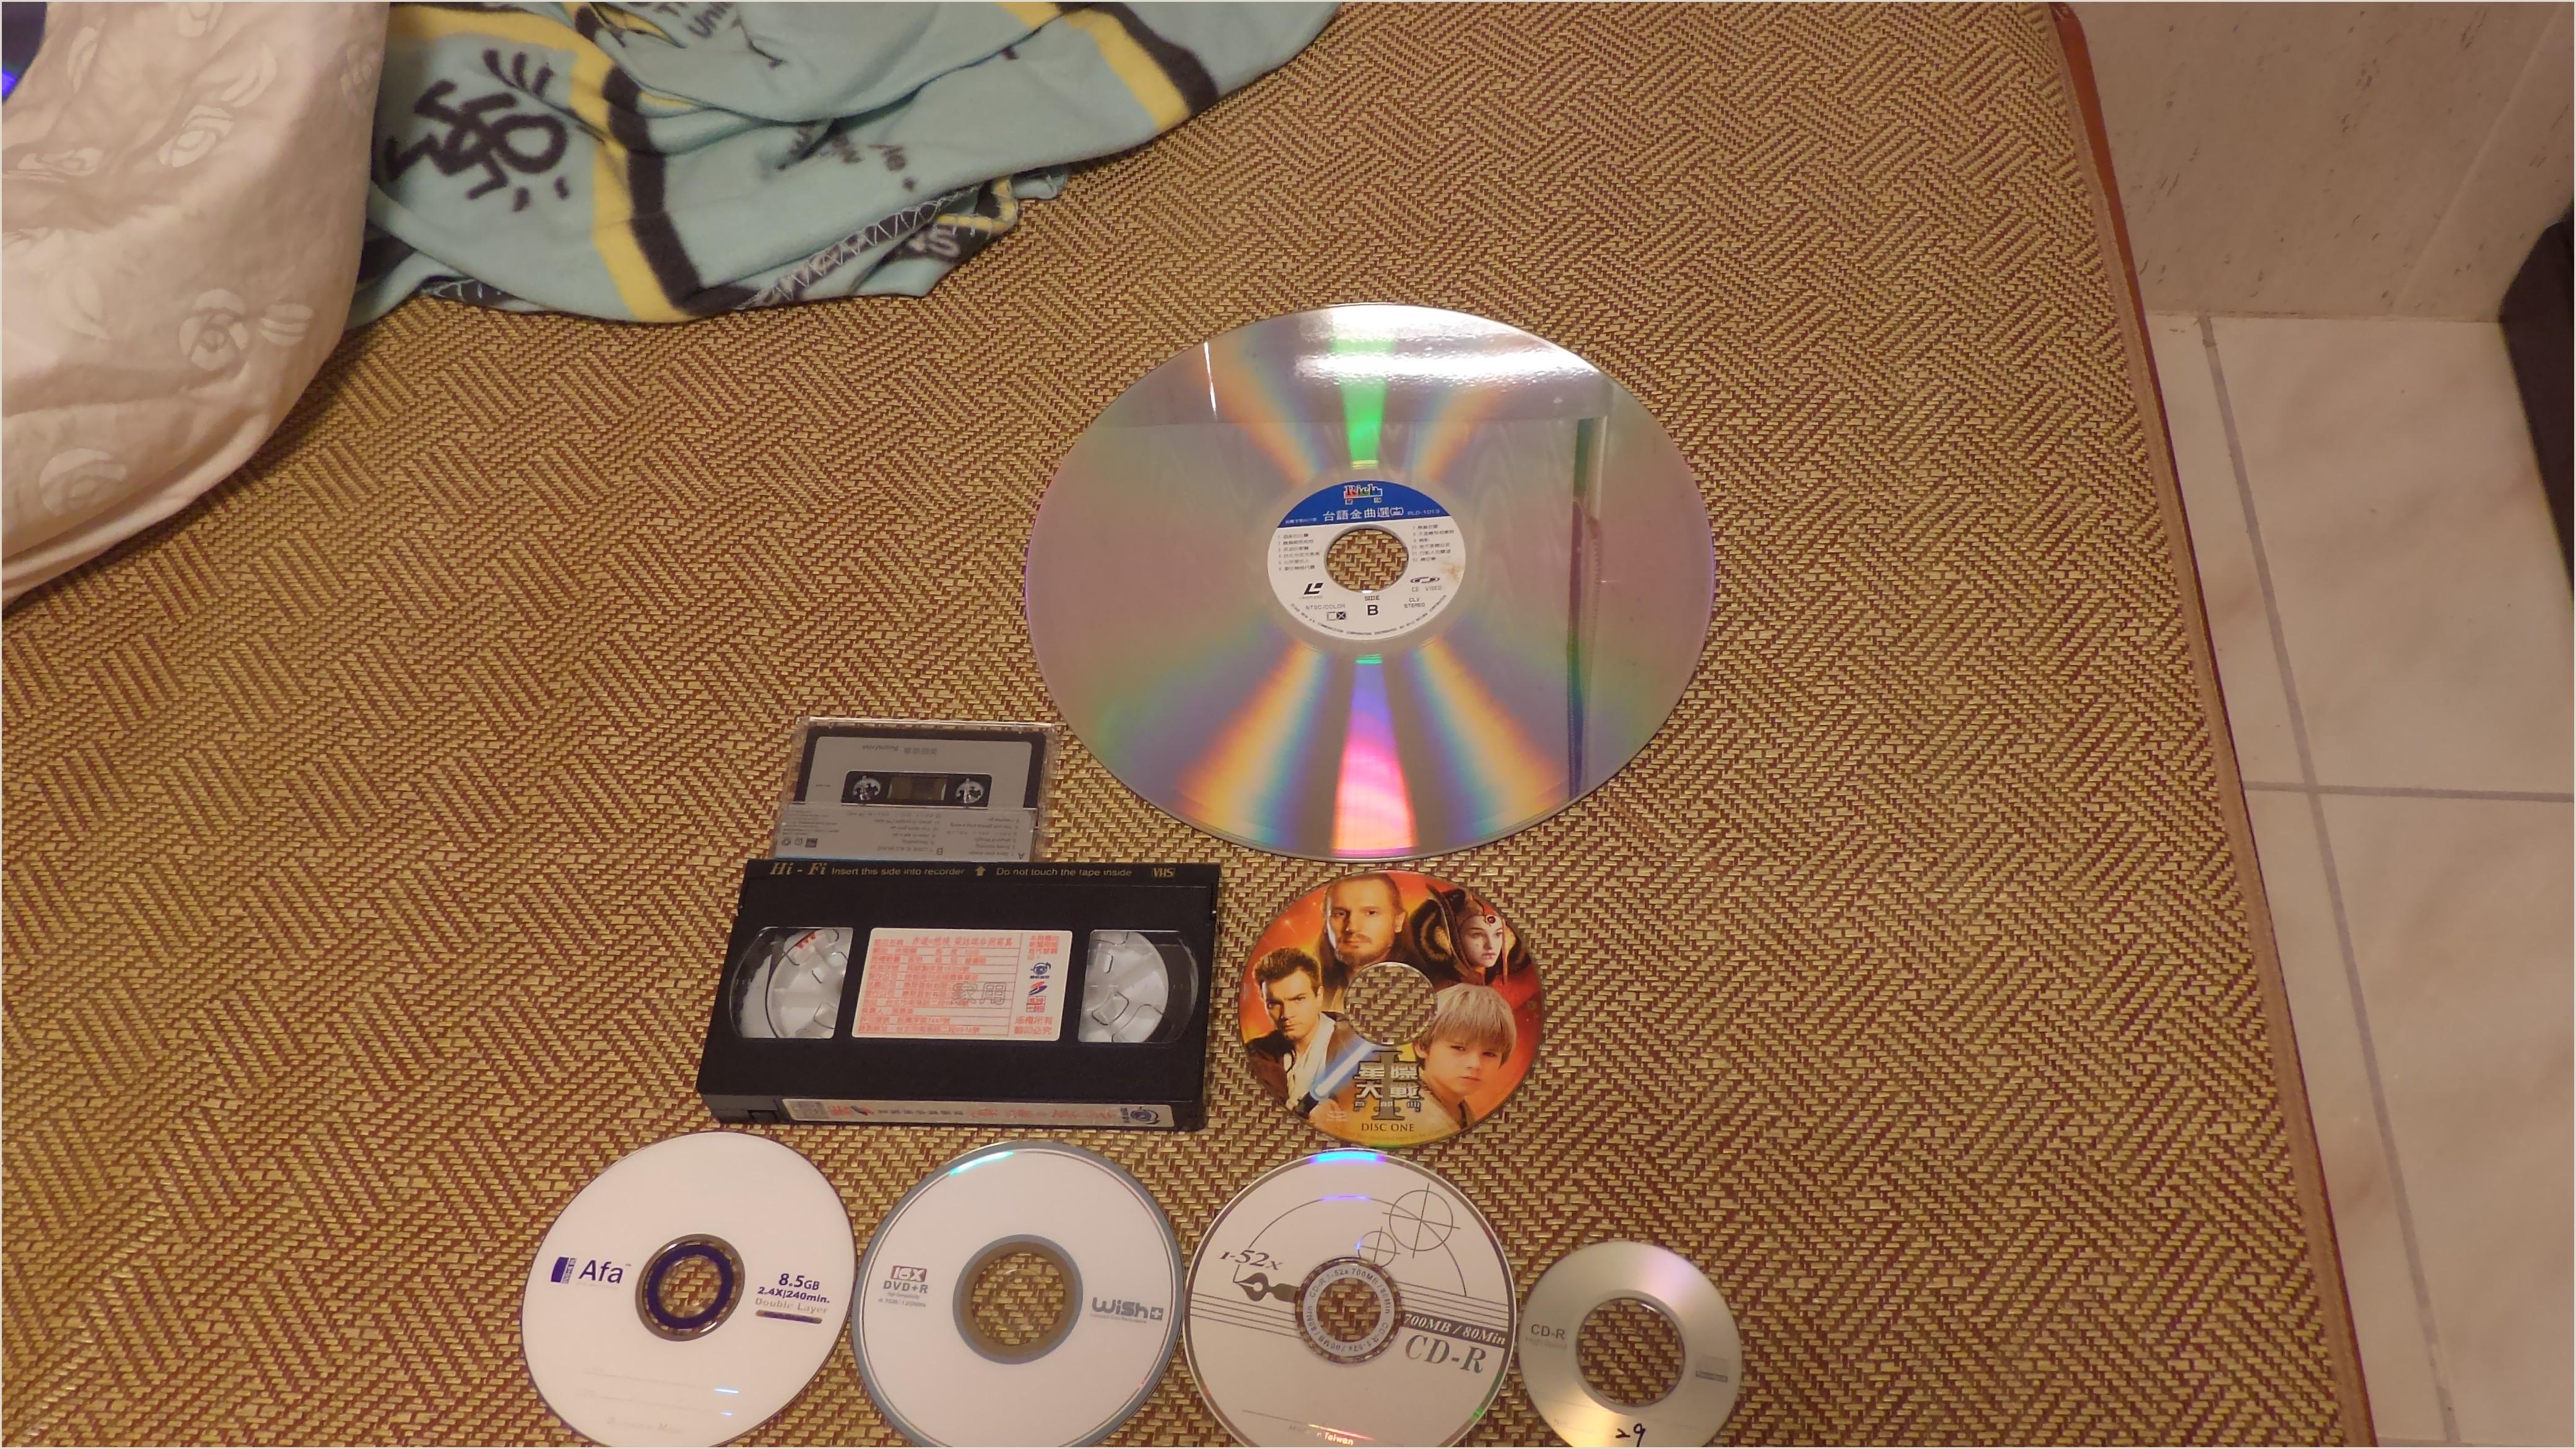 Optical disc